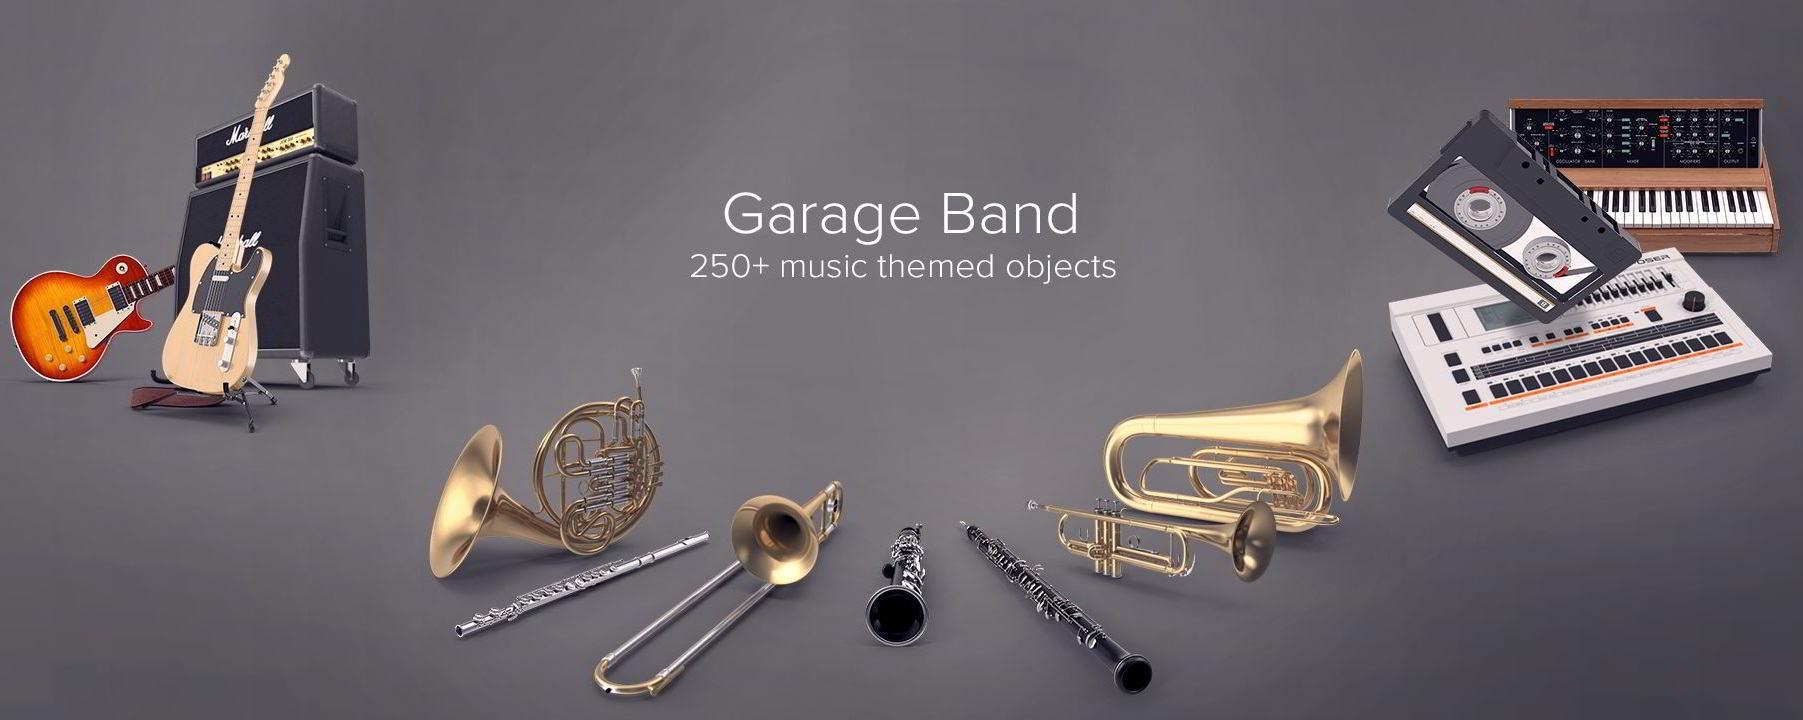 PixelSquid – Garage Band Collection free download